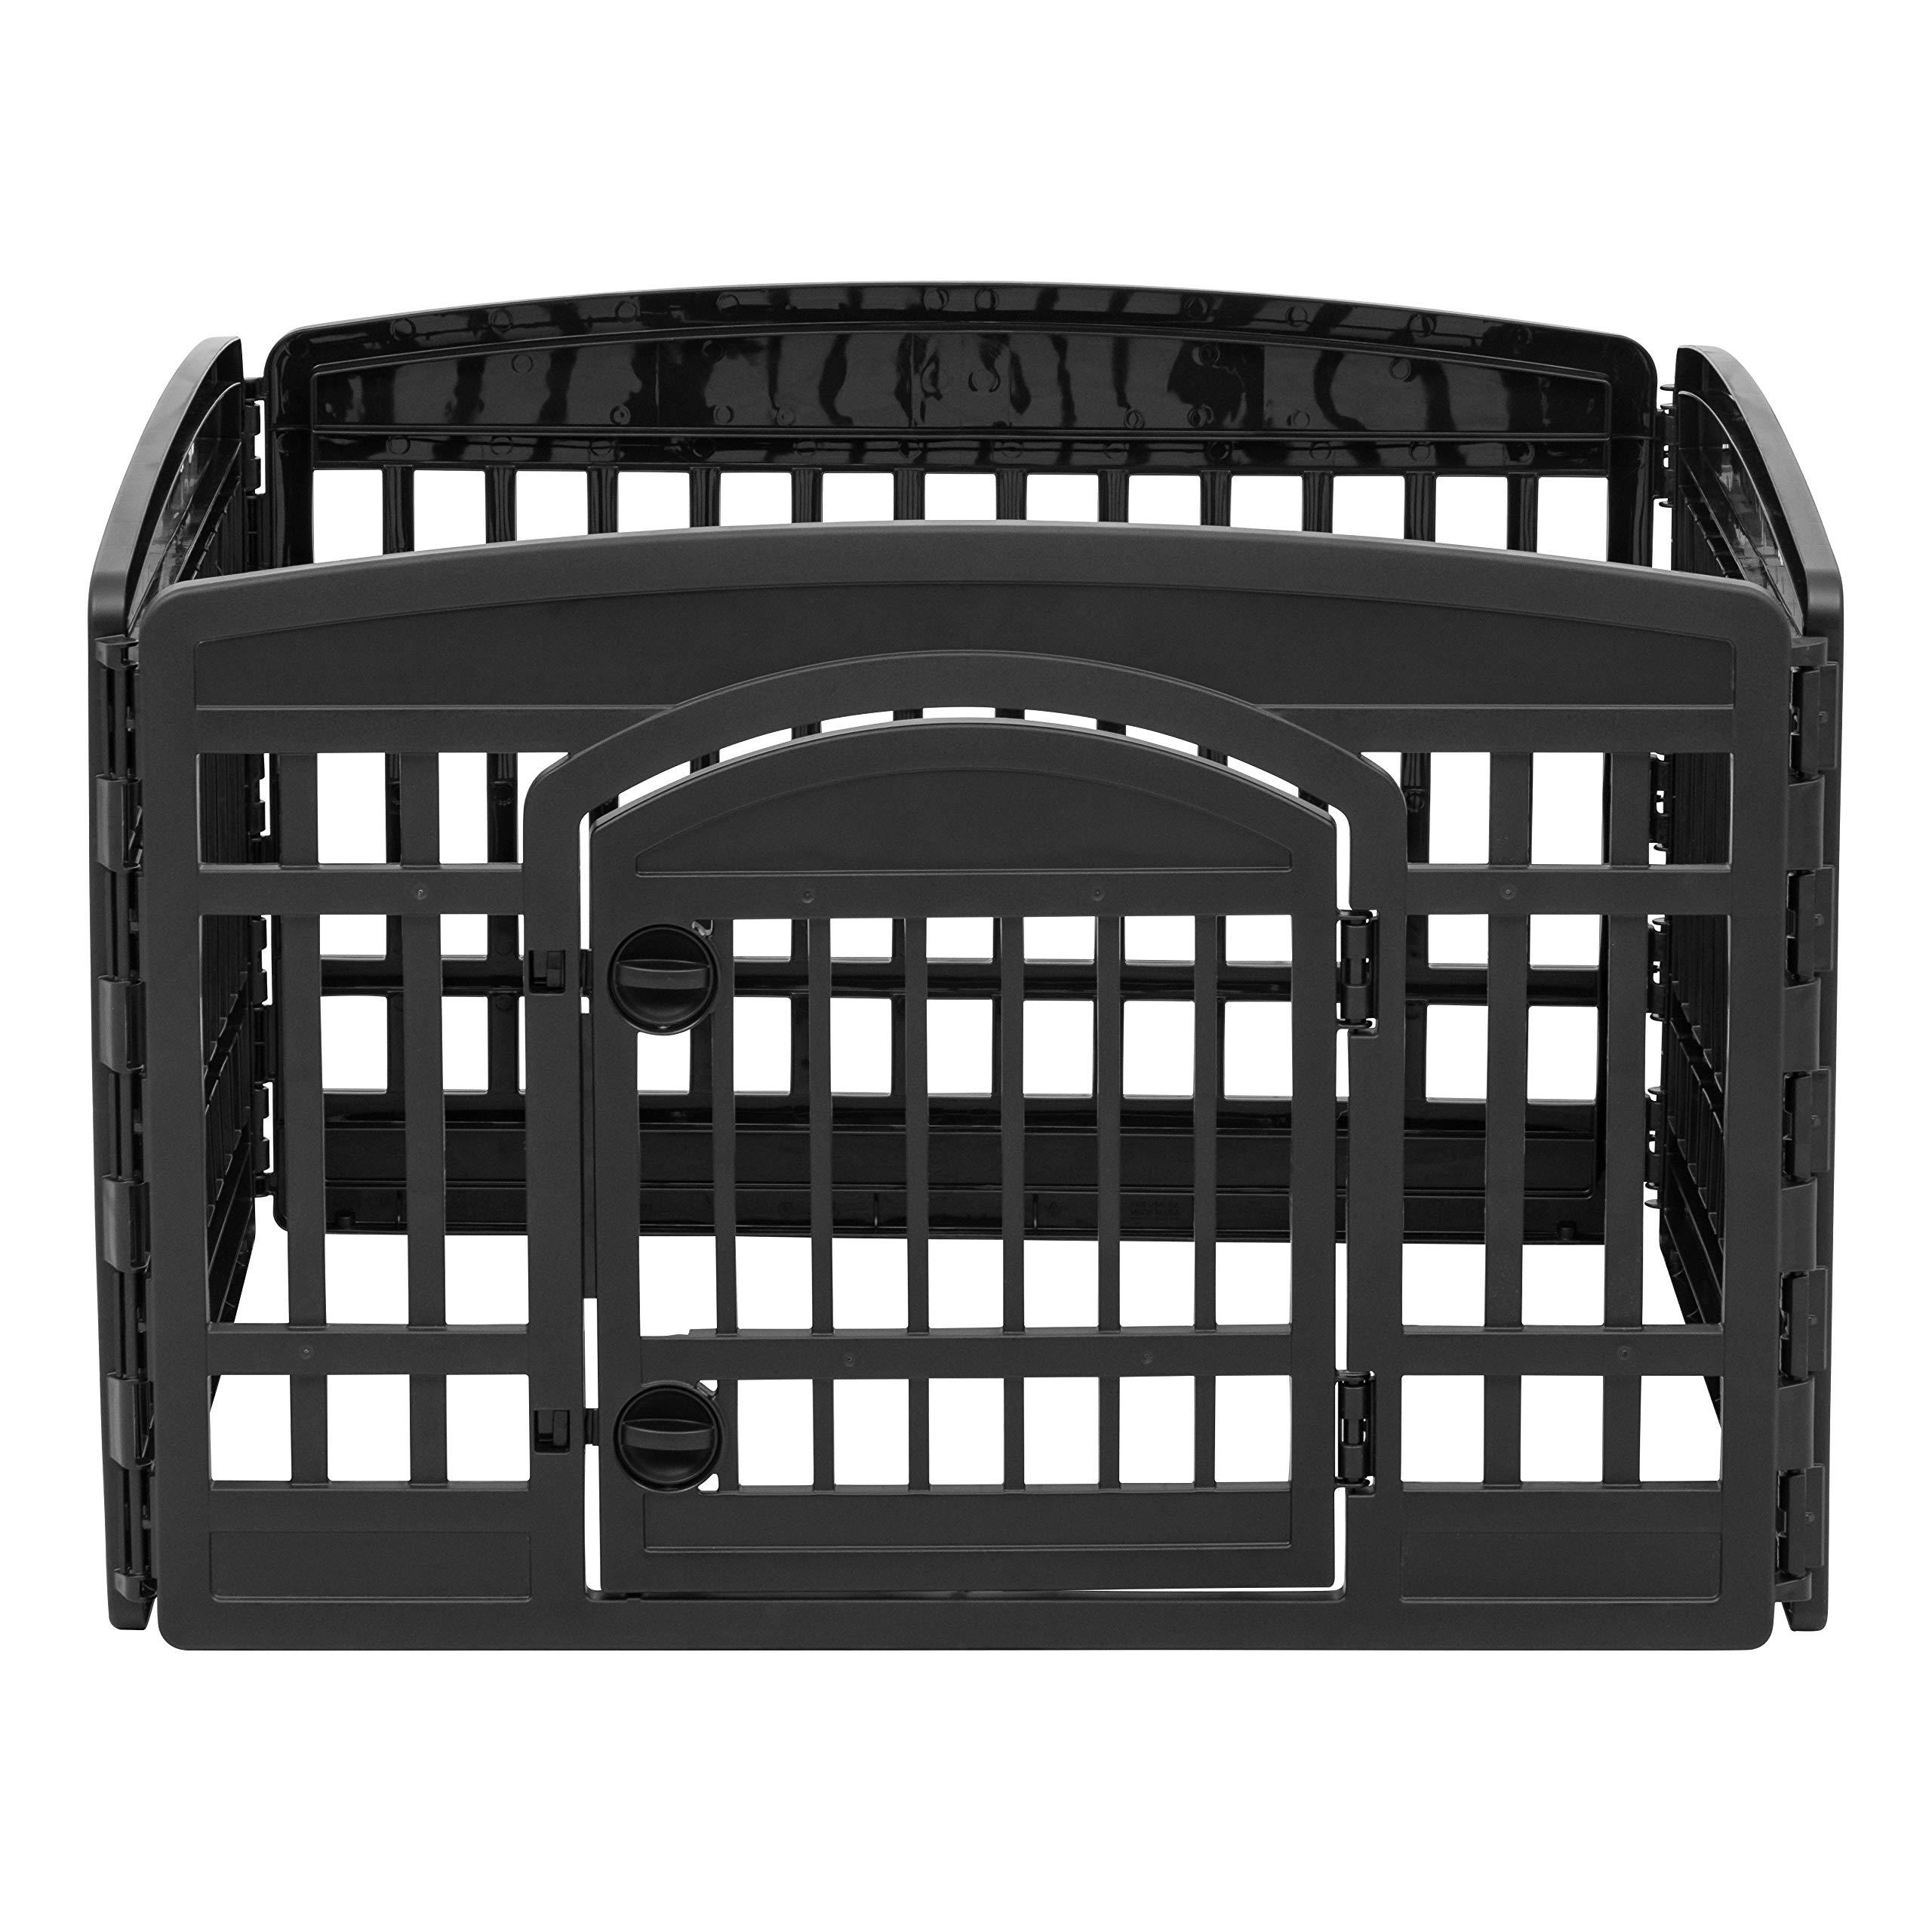 IRIS 24'' 4 Panel Exercise Pet Playpen with Door, Black by IRIS USA, Inc. (Image #2)